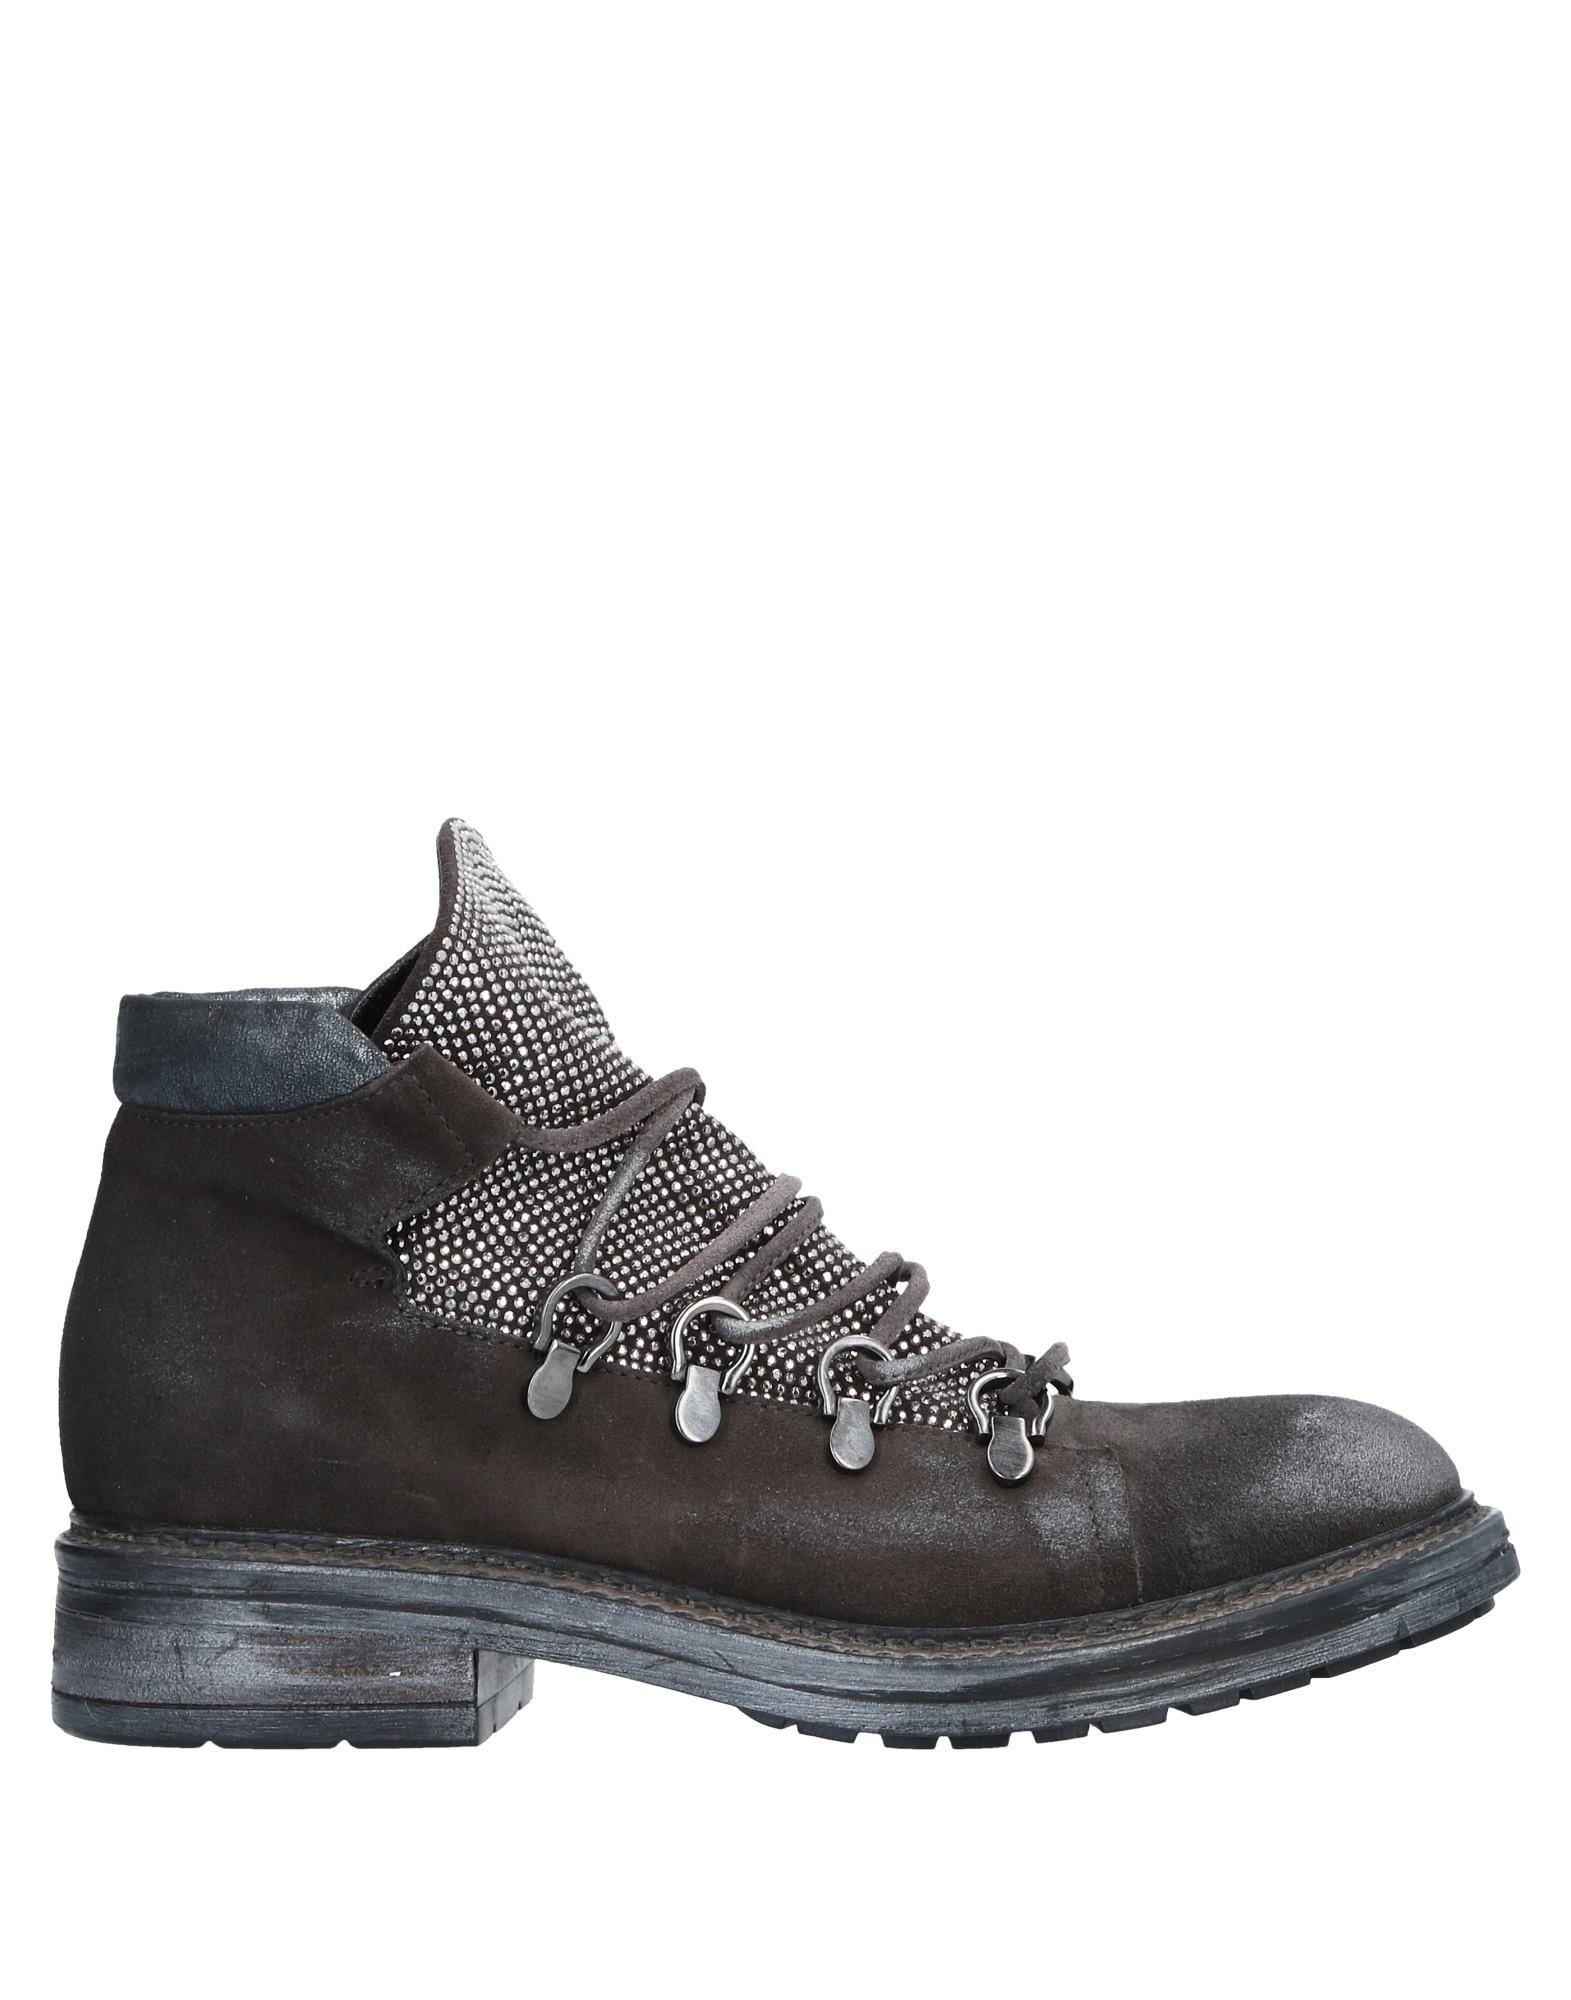 Stilvolle Damen billige Schuhe Fru.It Stiefelette Damen Stilvolle  11532565KR 9b4424